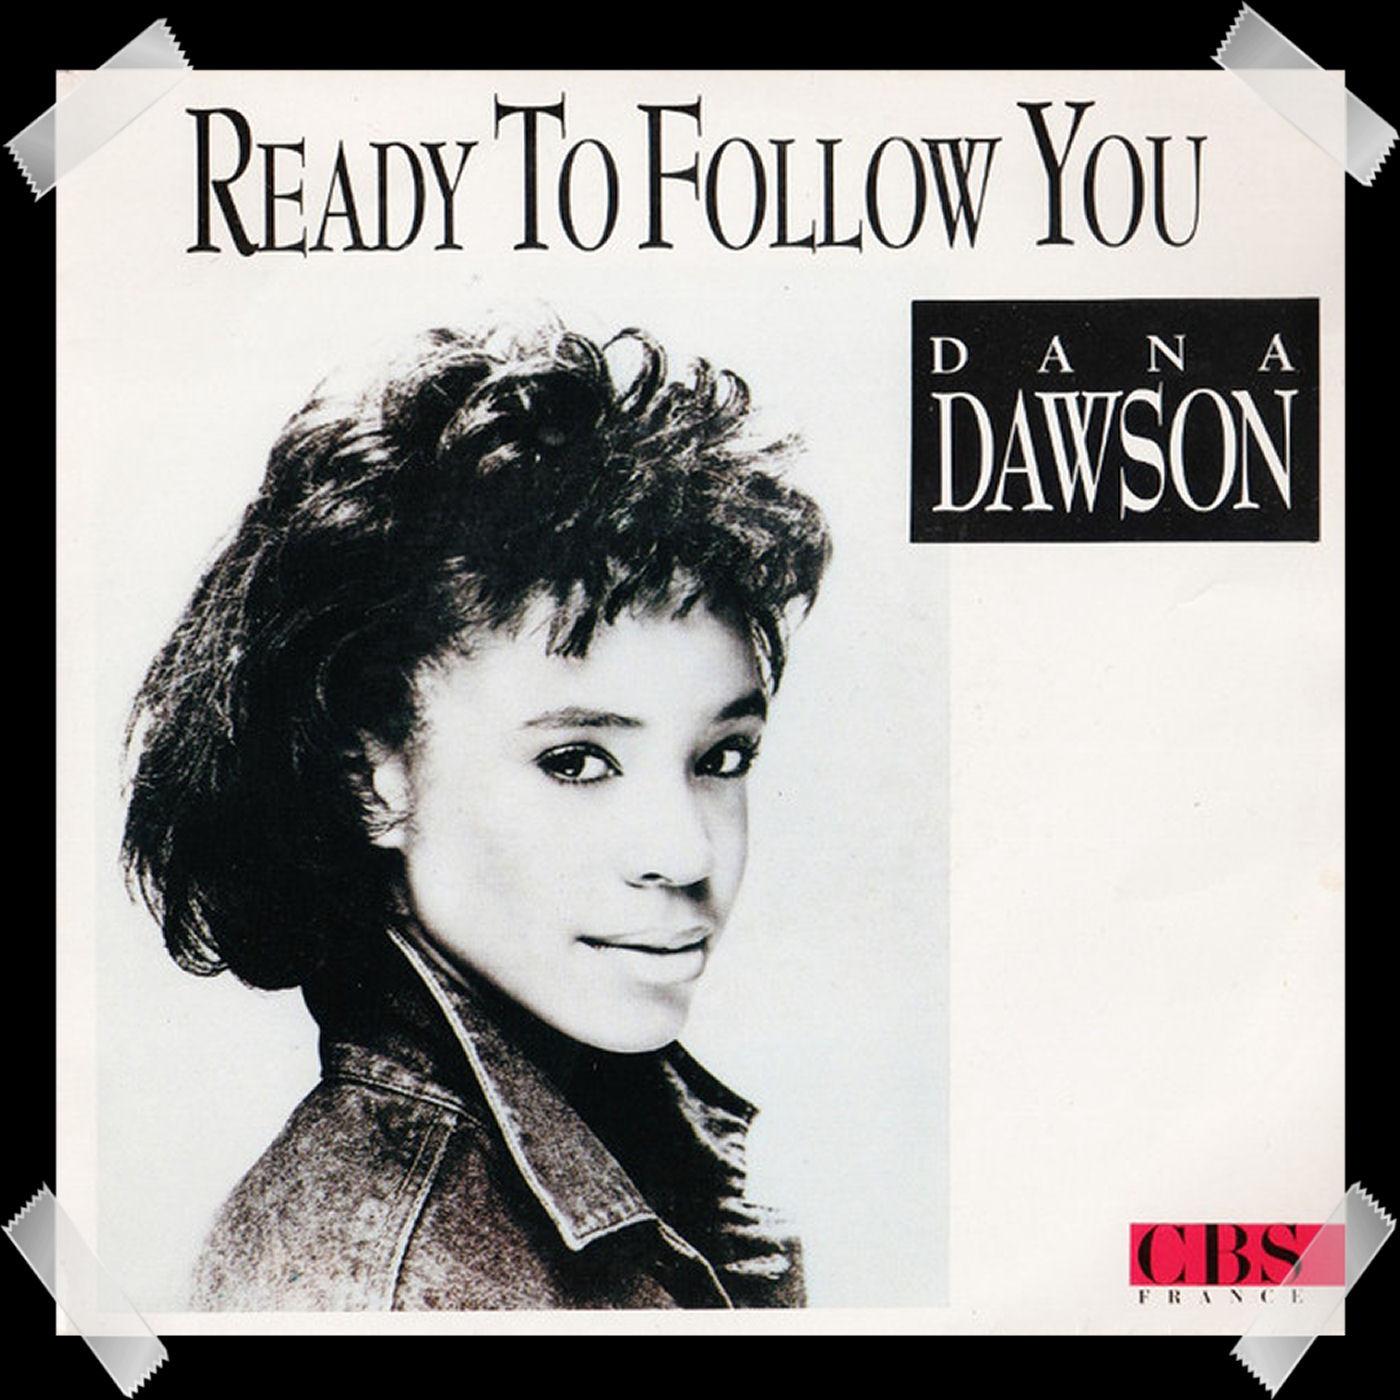 26. Dana Dawson - Ready To Follow You